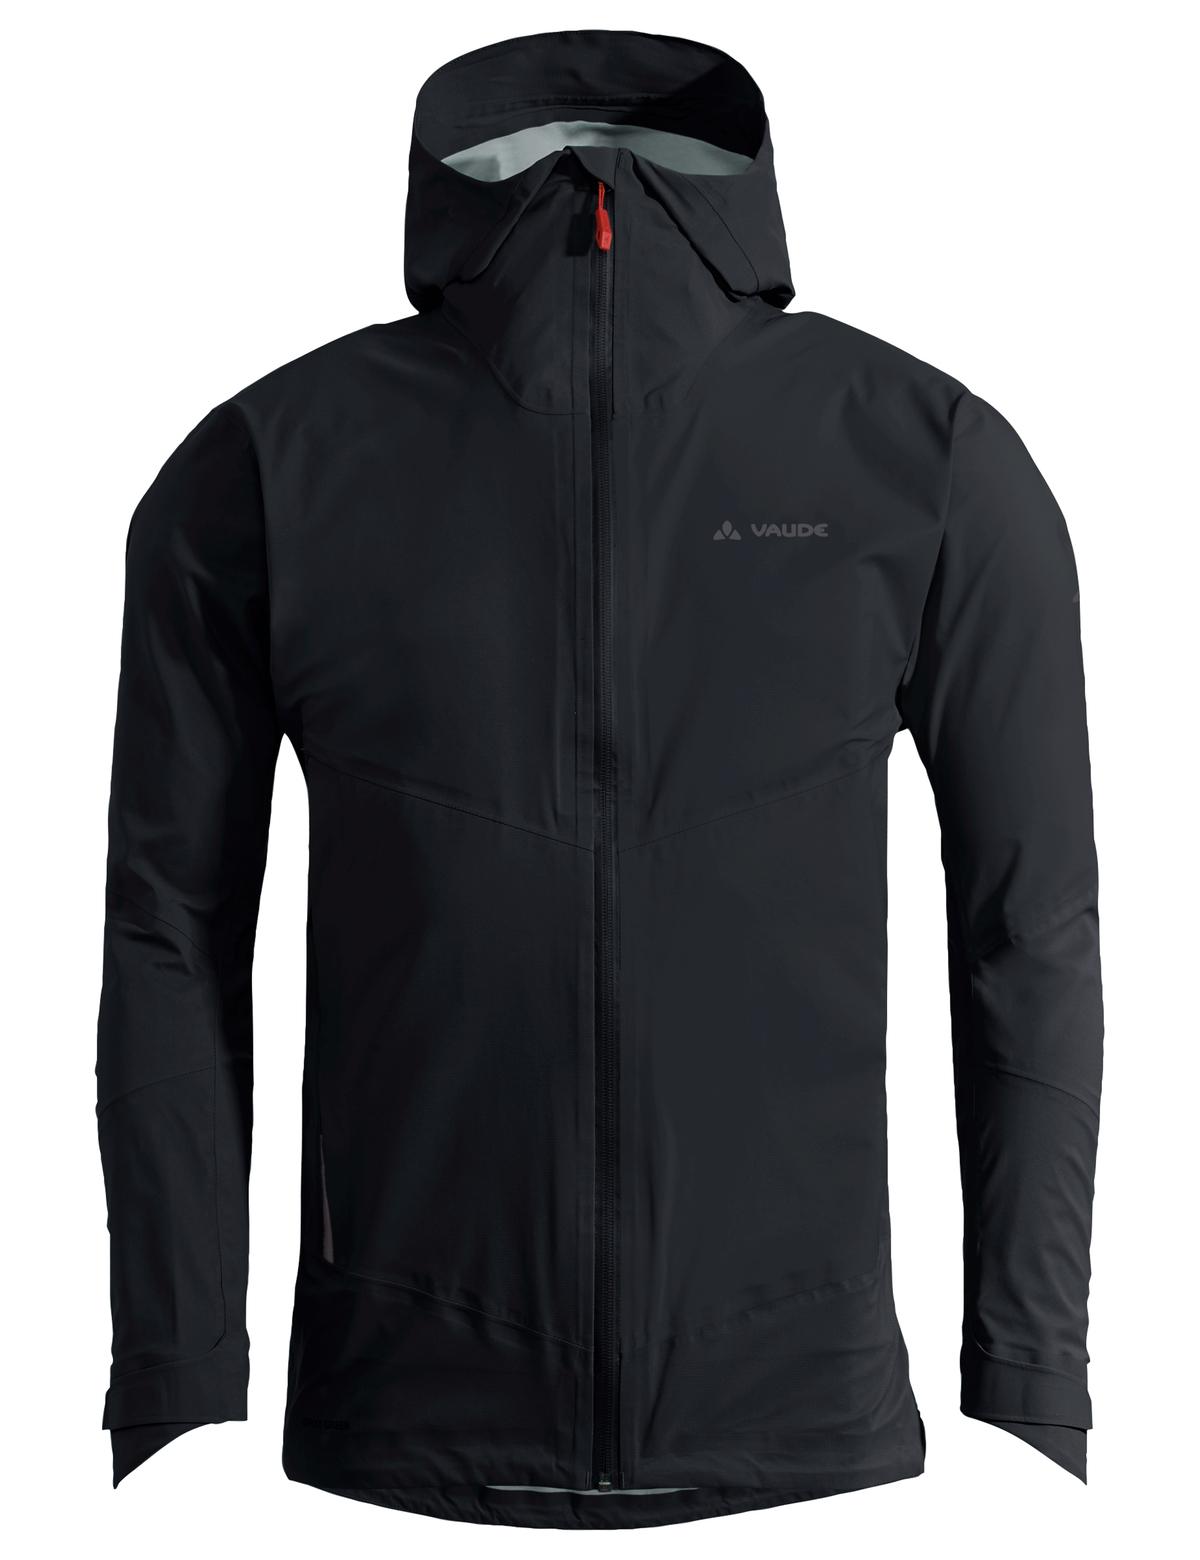 Vaude Croz 3L Jacket III - Veste imperméable homme